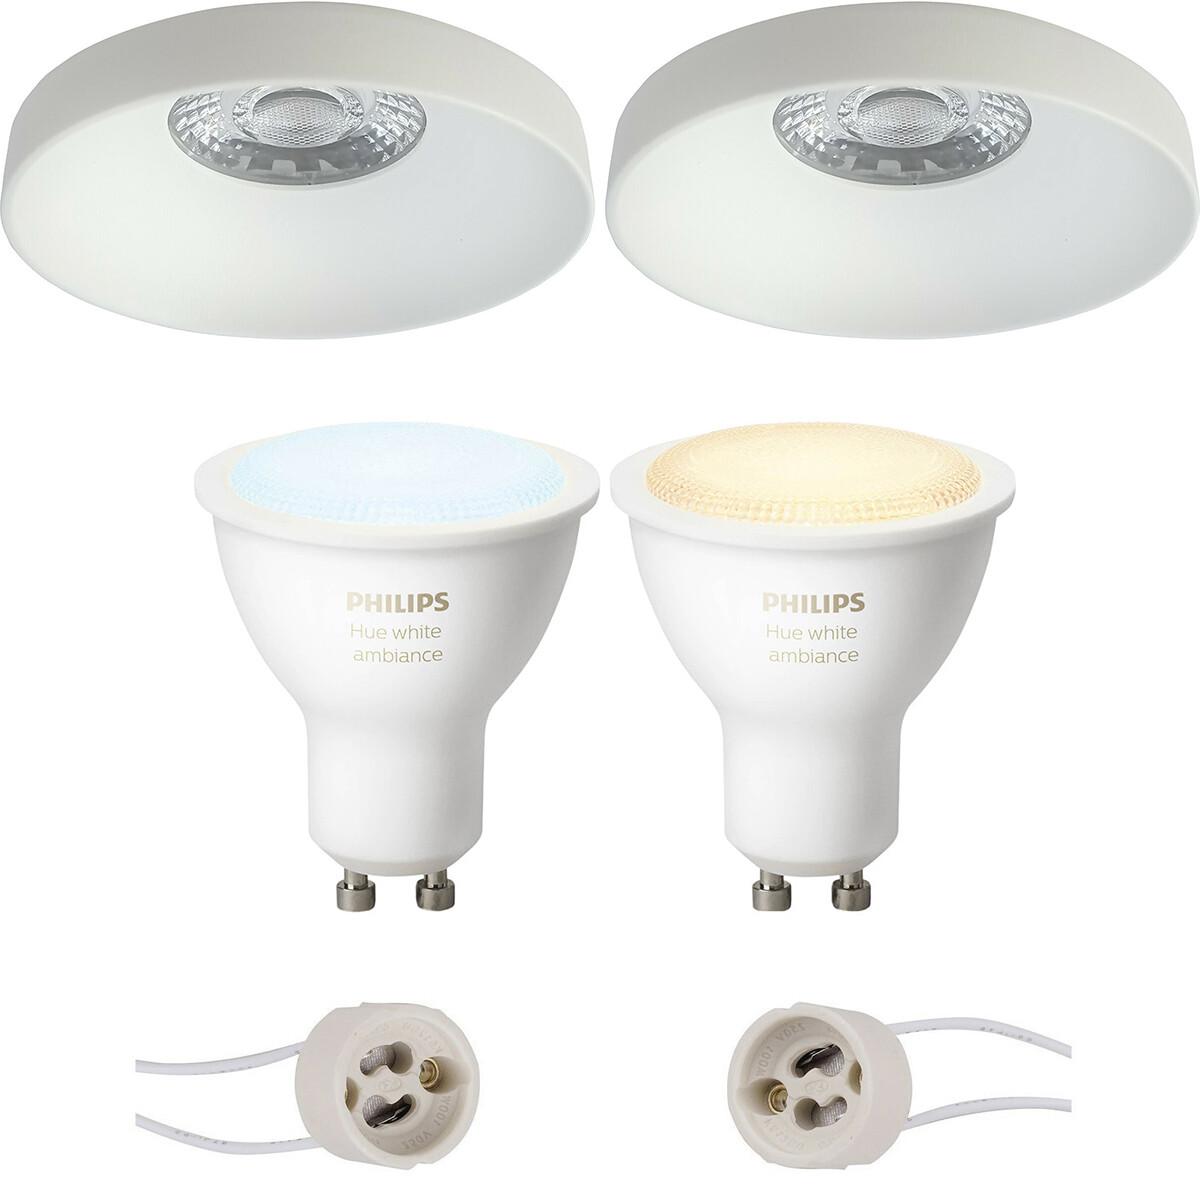 Pragmi Vrito Pro - Inbouw Rond - Mat Wit - Ø82mm - Philips Hue - LED Spot Set GU10 - White Ambiance